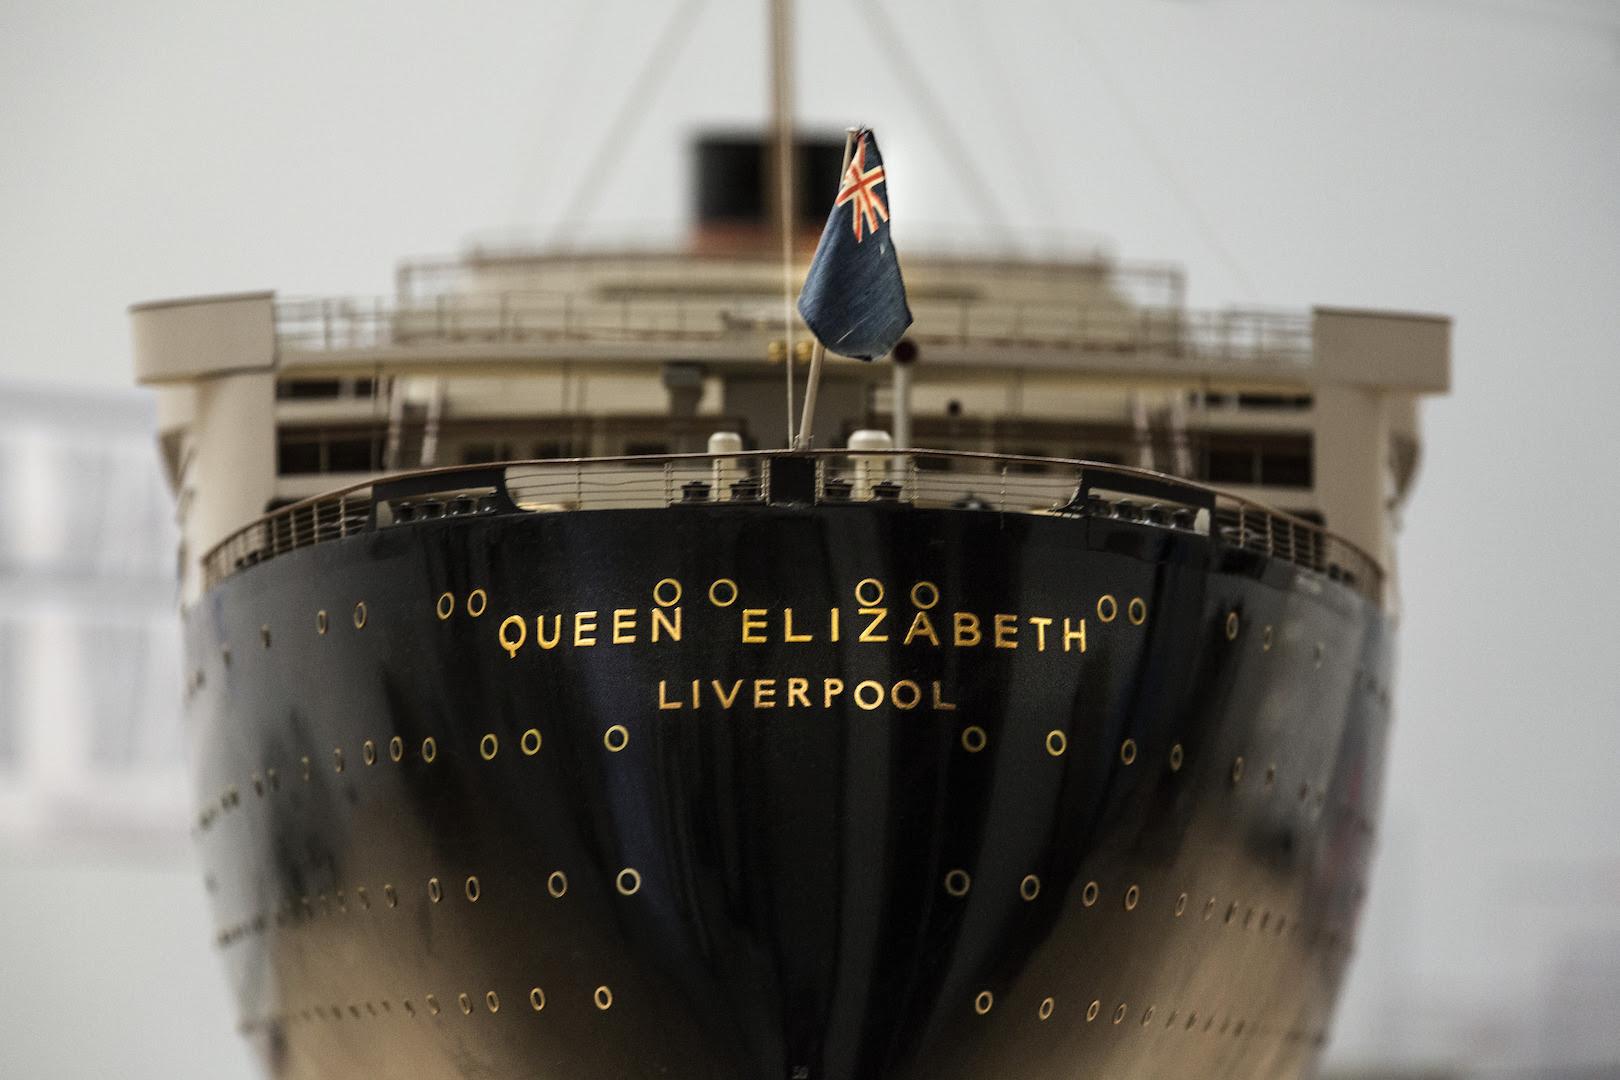 Stern detail of Bassett-Lowke LTD, Model of RMS Queen Elizabeth, 1947–1948. White mahogany, gunmetal, brass. Peabody Essex Museum, Gift of Cunard Line Ltd.. © Peabody Essex Museum. Photography by Bob Packert.